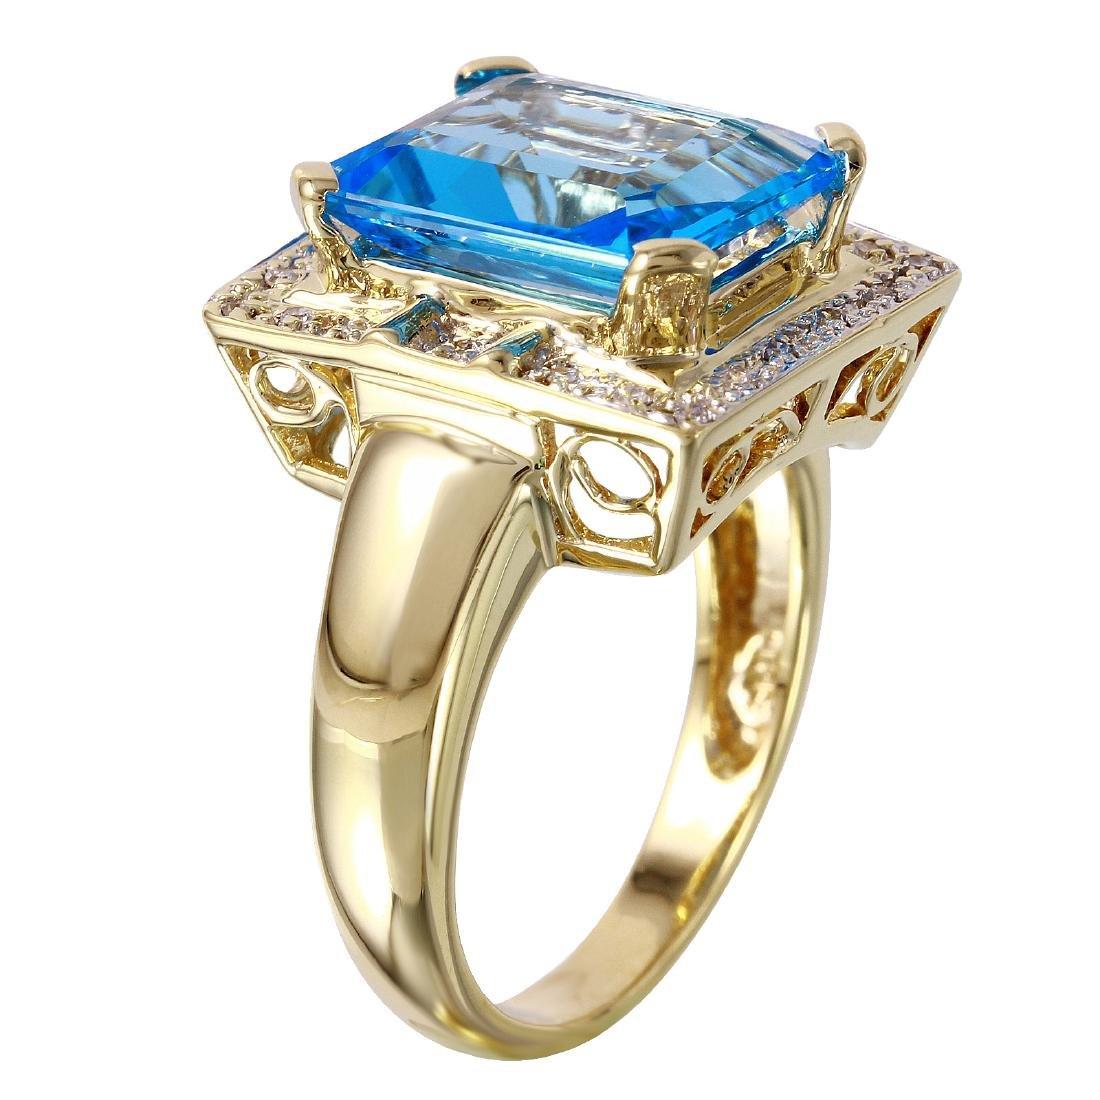 14KT Yellow Gold Topaz & Diamond Ring - 2